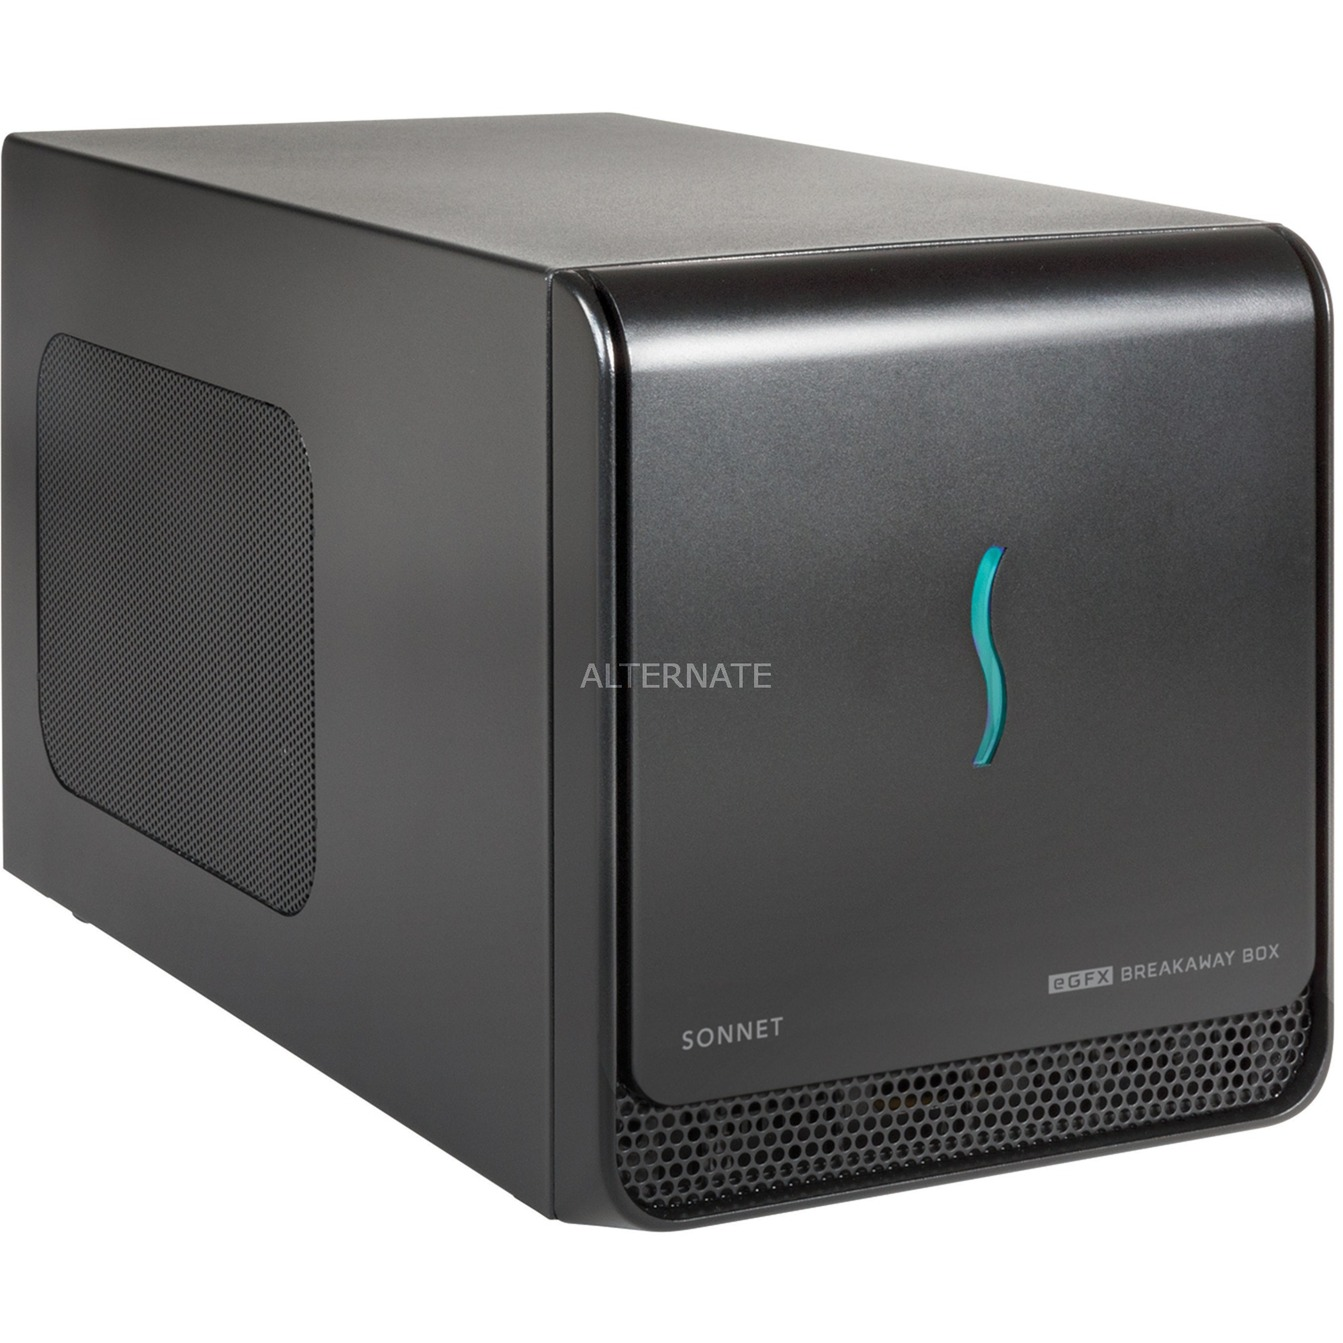 eGFX Breakaway Box 650 One FHFD x16 Graka slot - Schnittstellenkarte - PCI Alámbrico, Caja/Carcasa